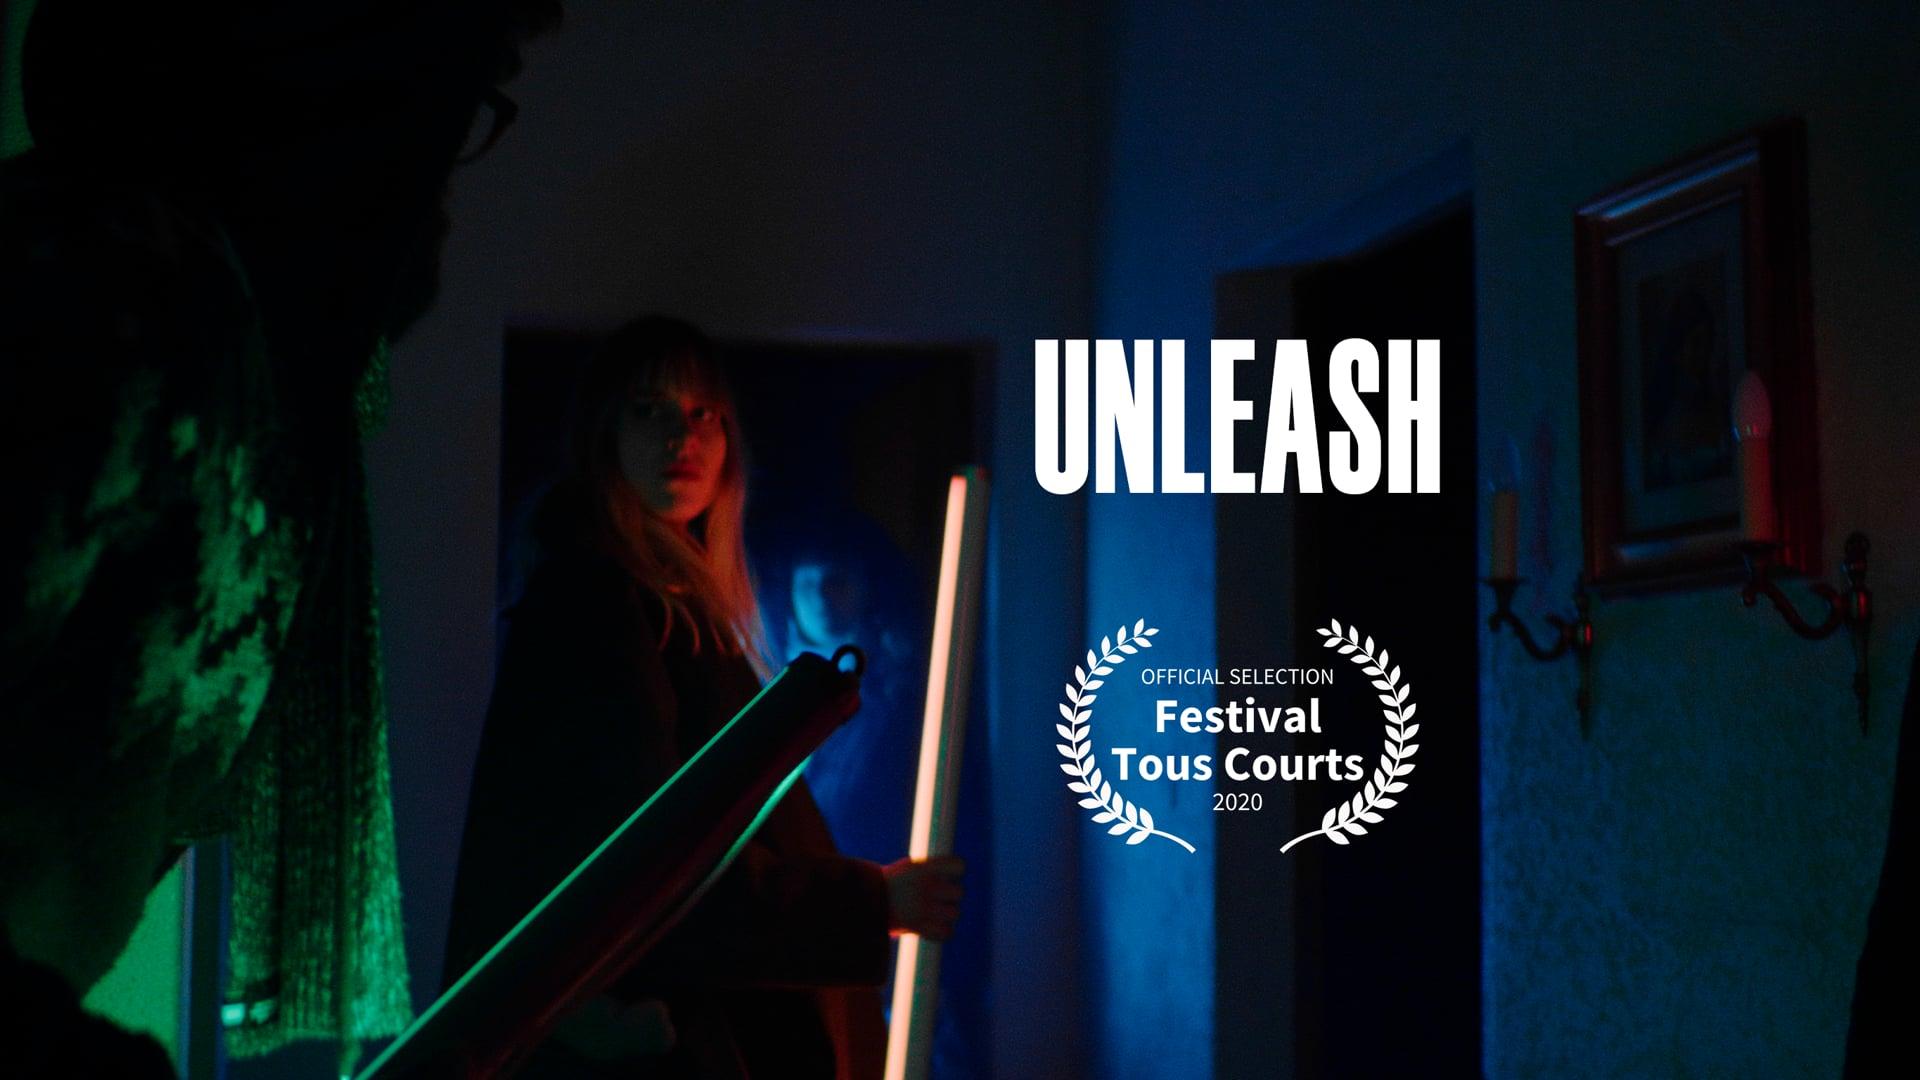 UNLEASH (2020) | coming soon | a short film by Sean Wirz